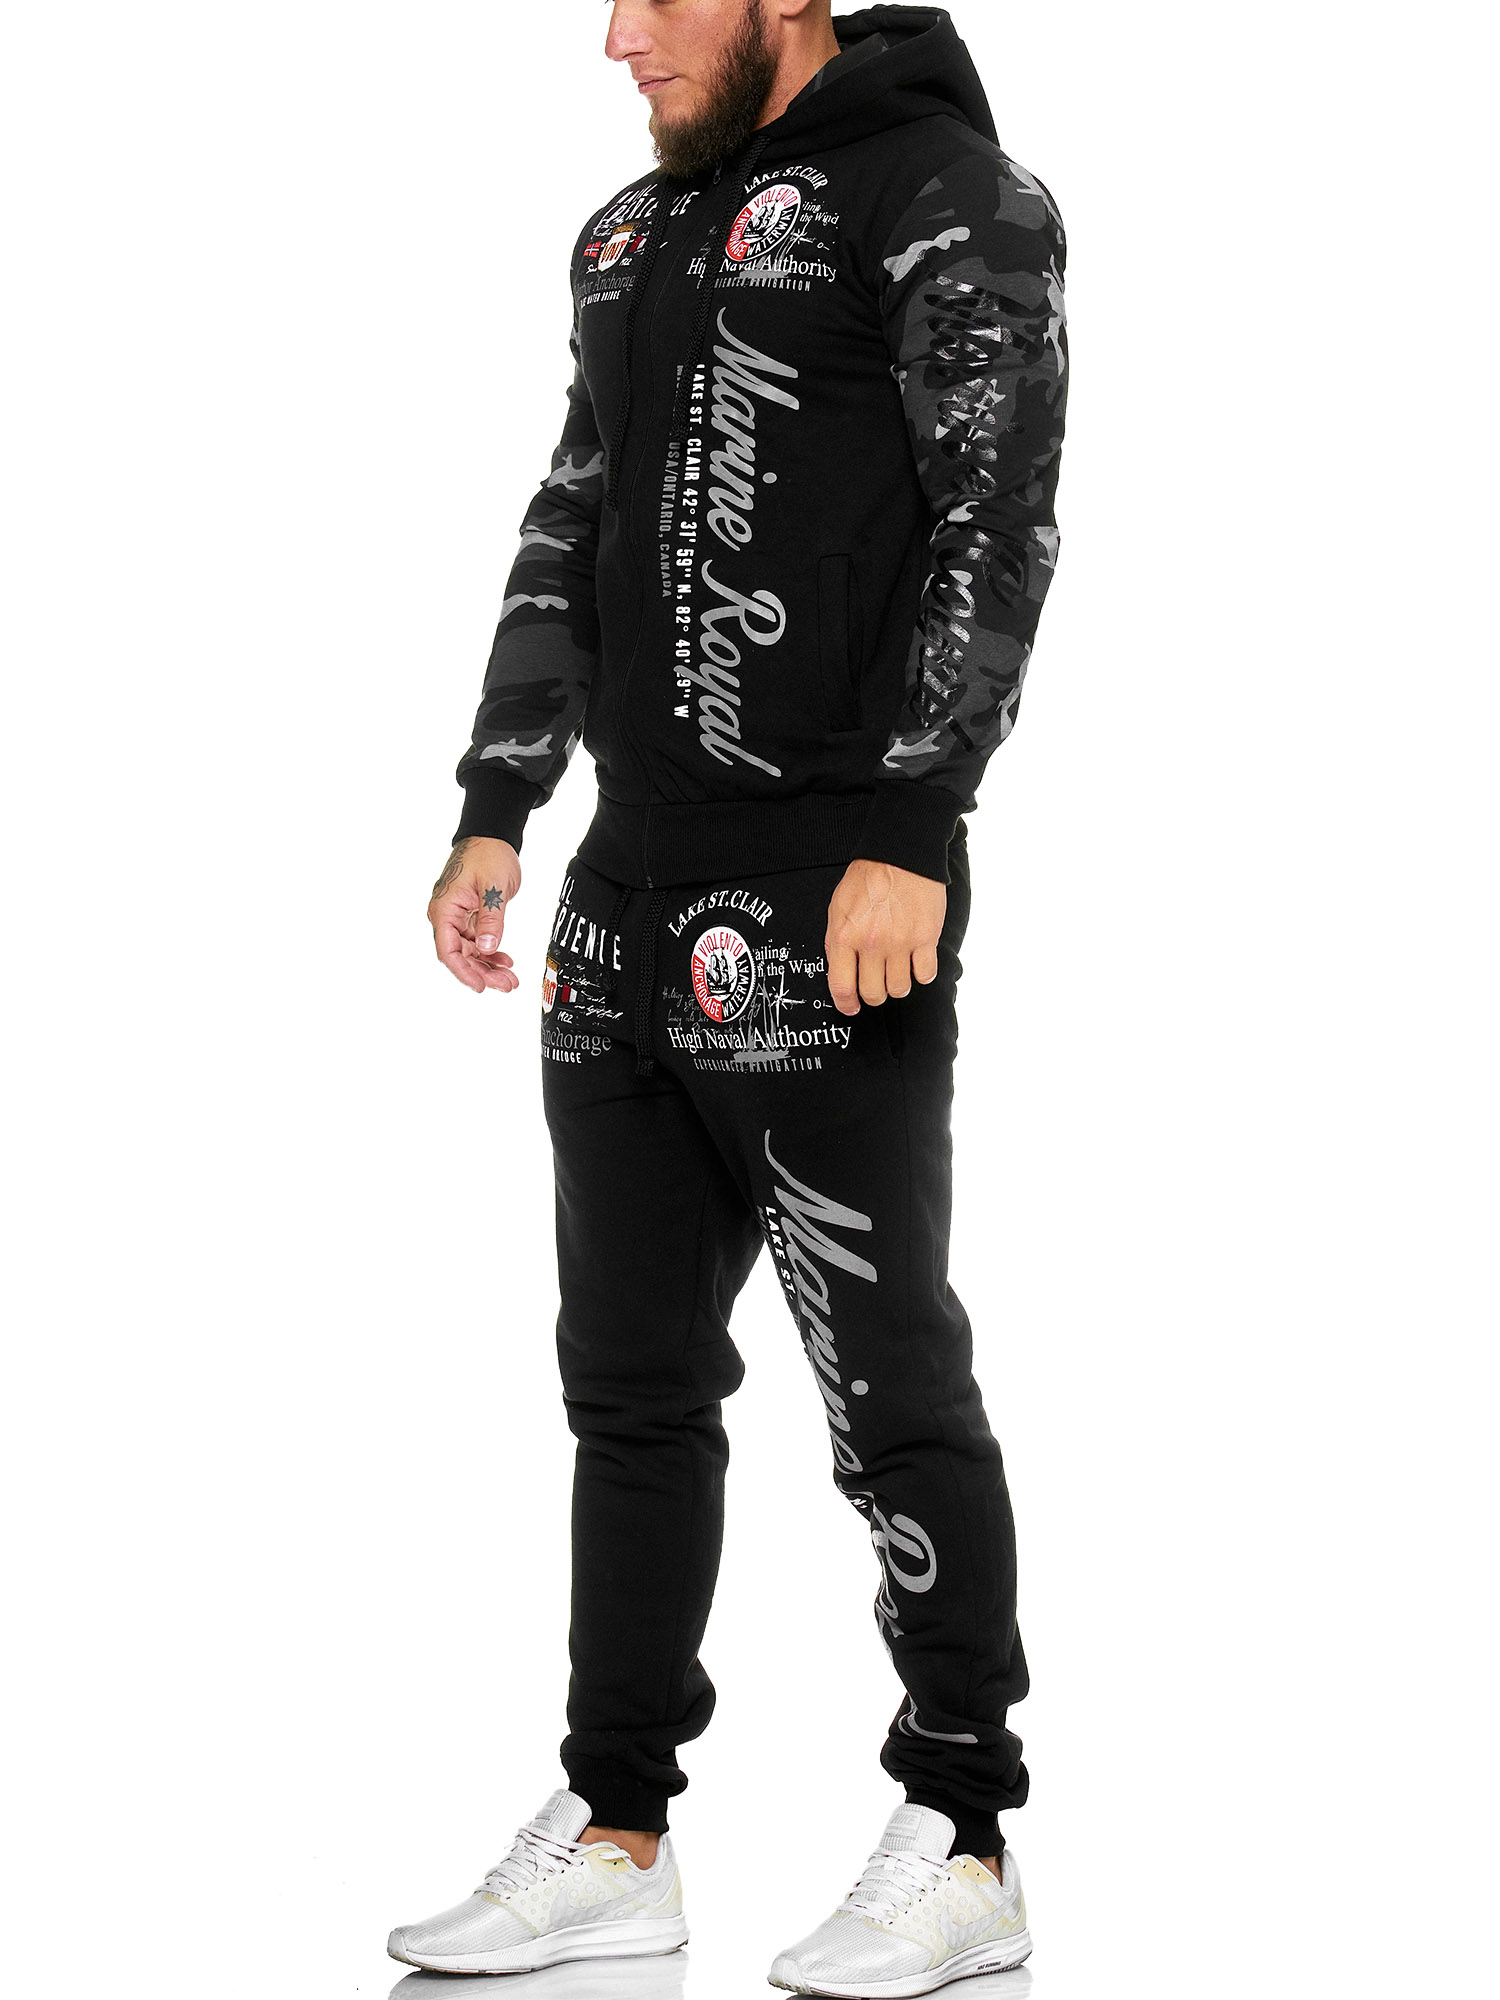 Damen-Jogginganzug-Frauen-Trainingsanzug-Sportanzug-Streetwear-JG-512-John-Kayna Indexbild 62